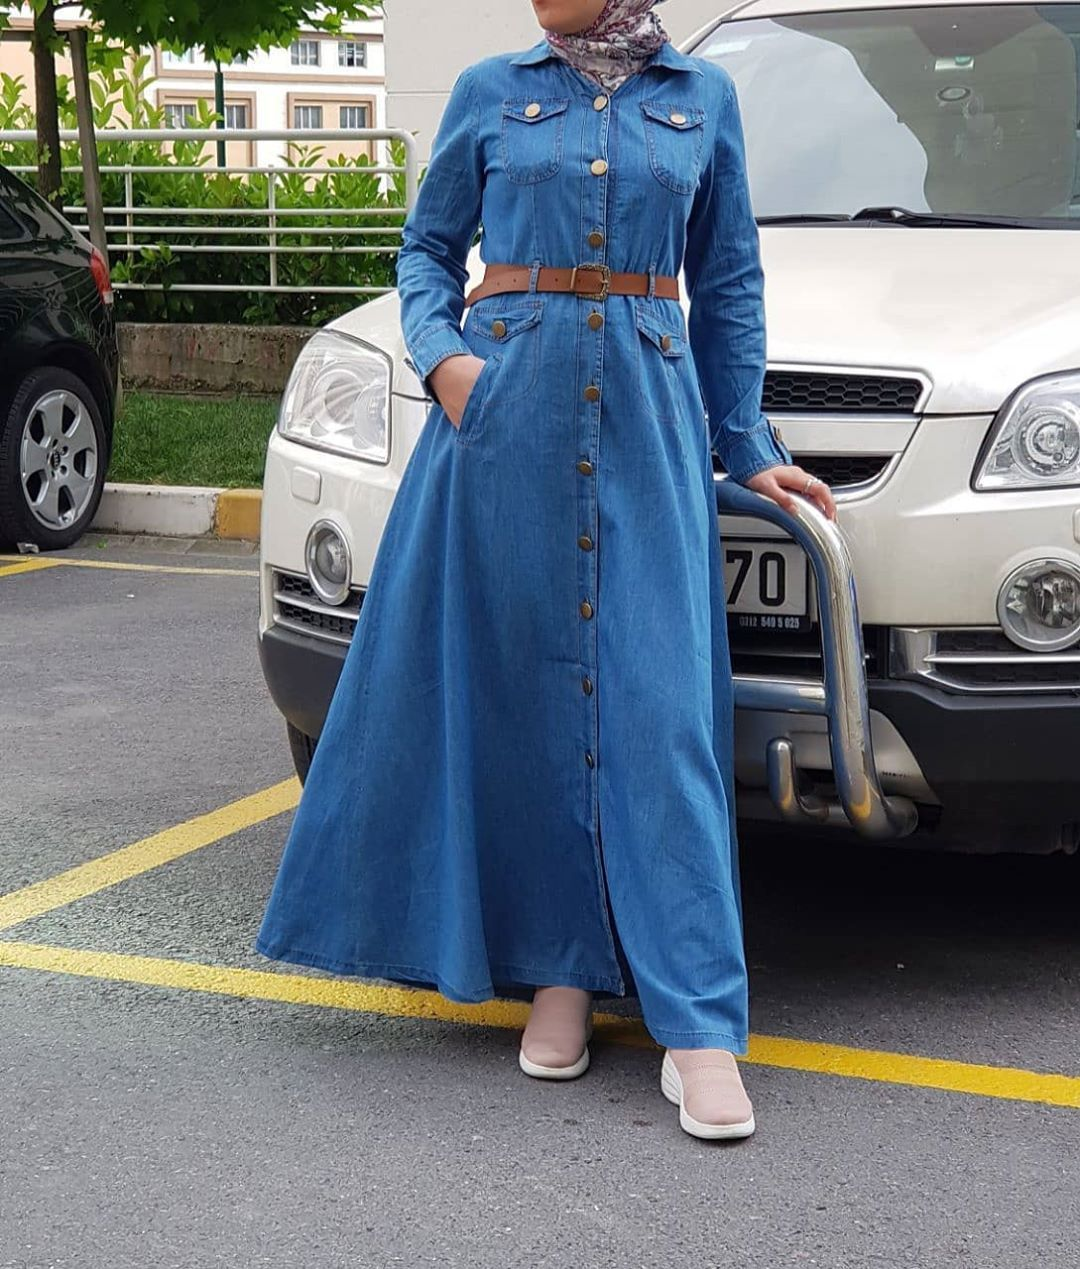 Moda Lolva On Instagram جديد وحصري من مودا لولفا دريس سيمبل جينز صيفي خفيف قالب واسع قياساااات من 3 Shirt Dress High Waisted Skirt Fashion